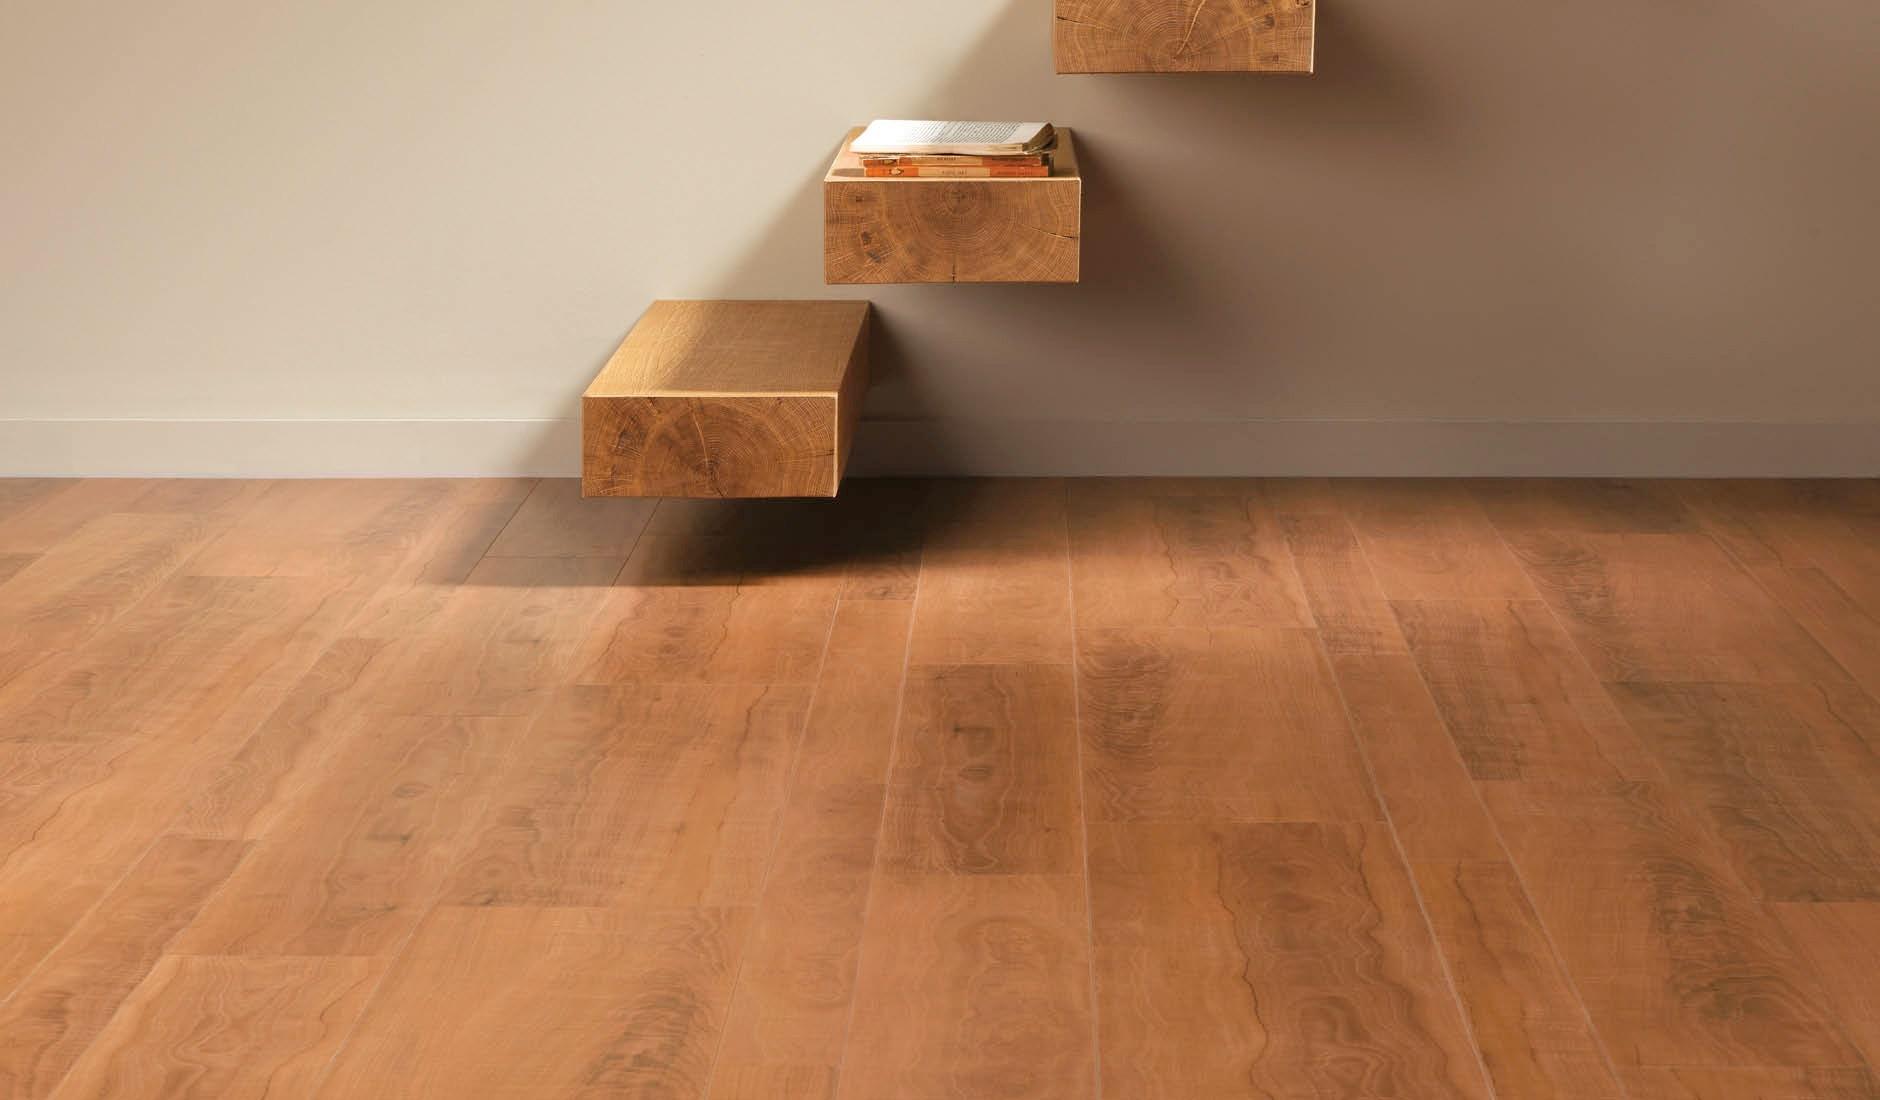 Laminate Flooring Buy Hardwood Floors Discounted Floor Laminate wood flooring pictures